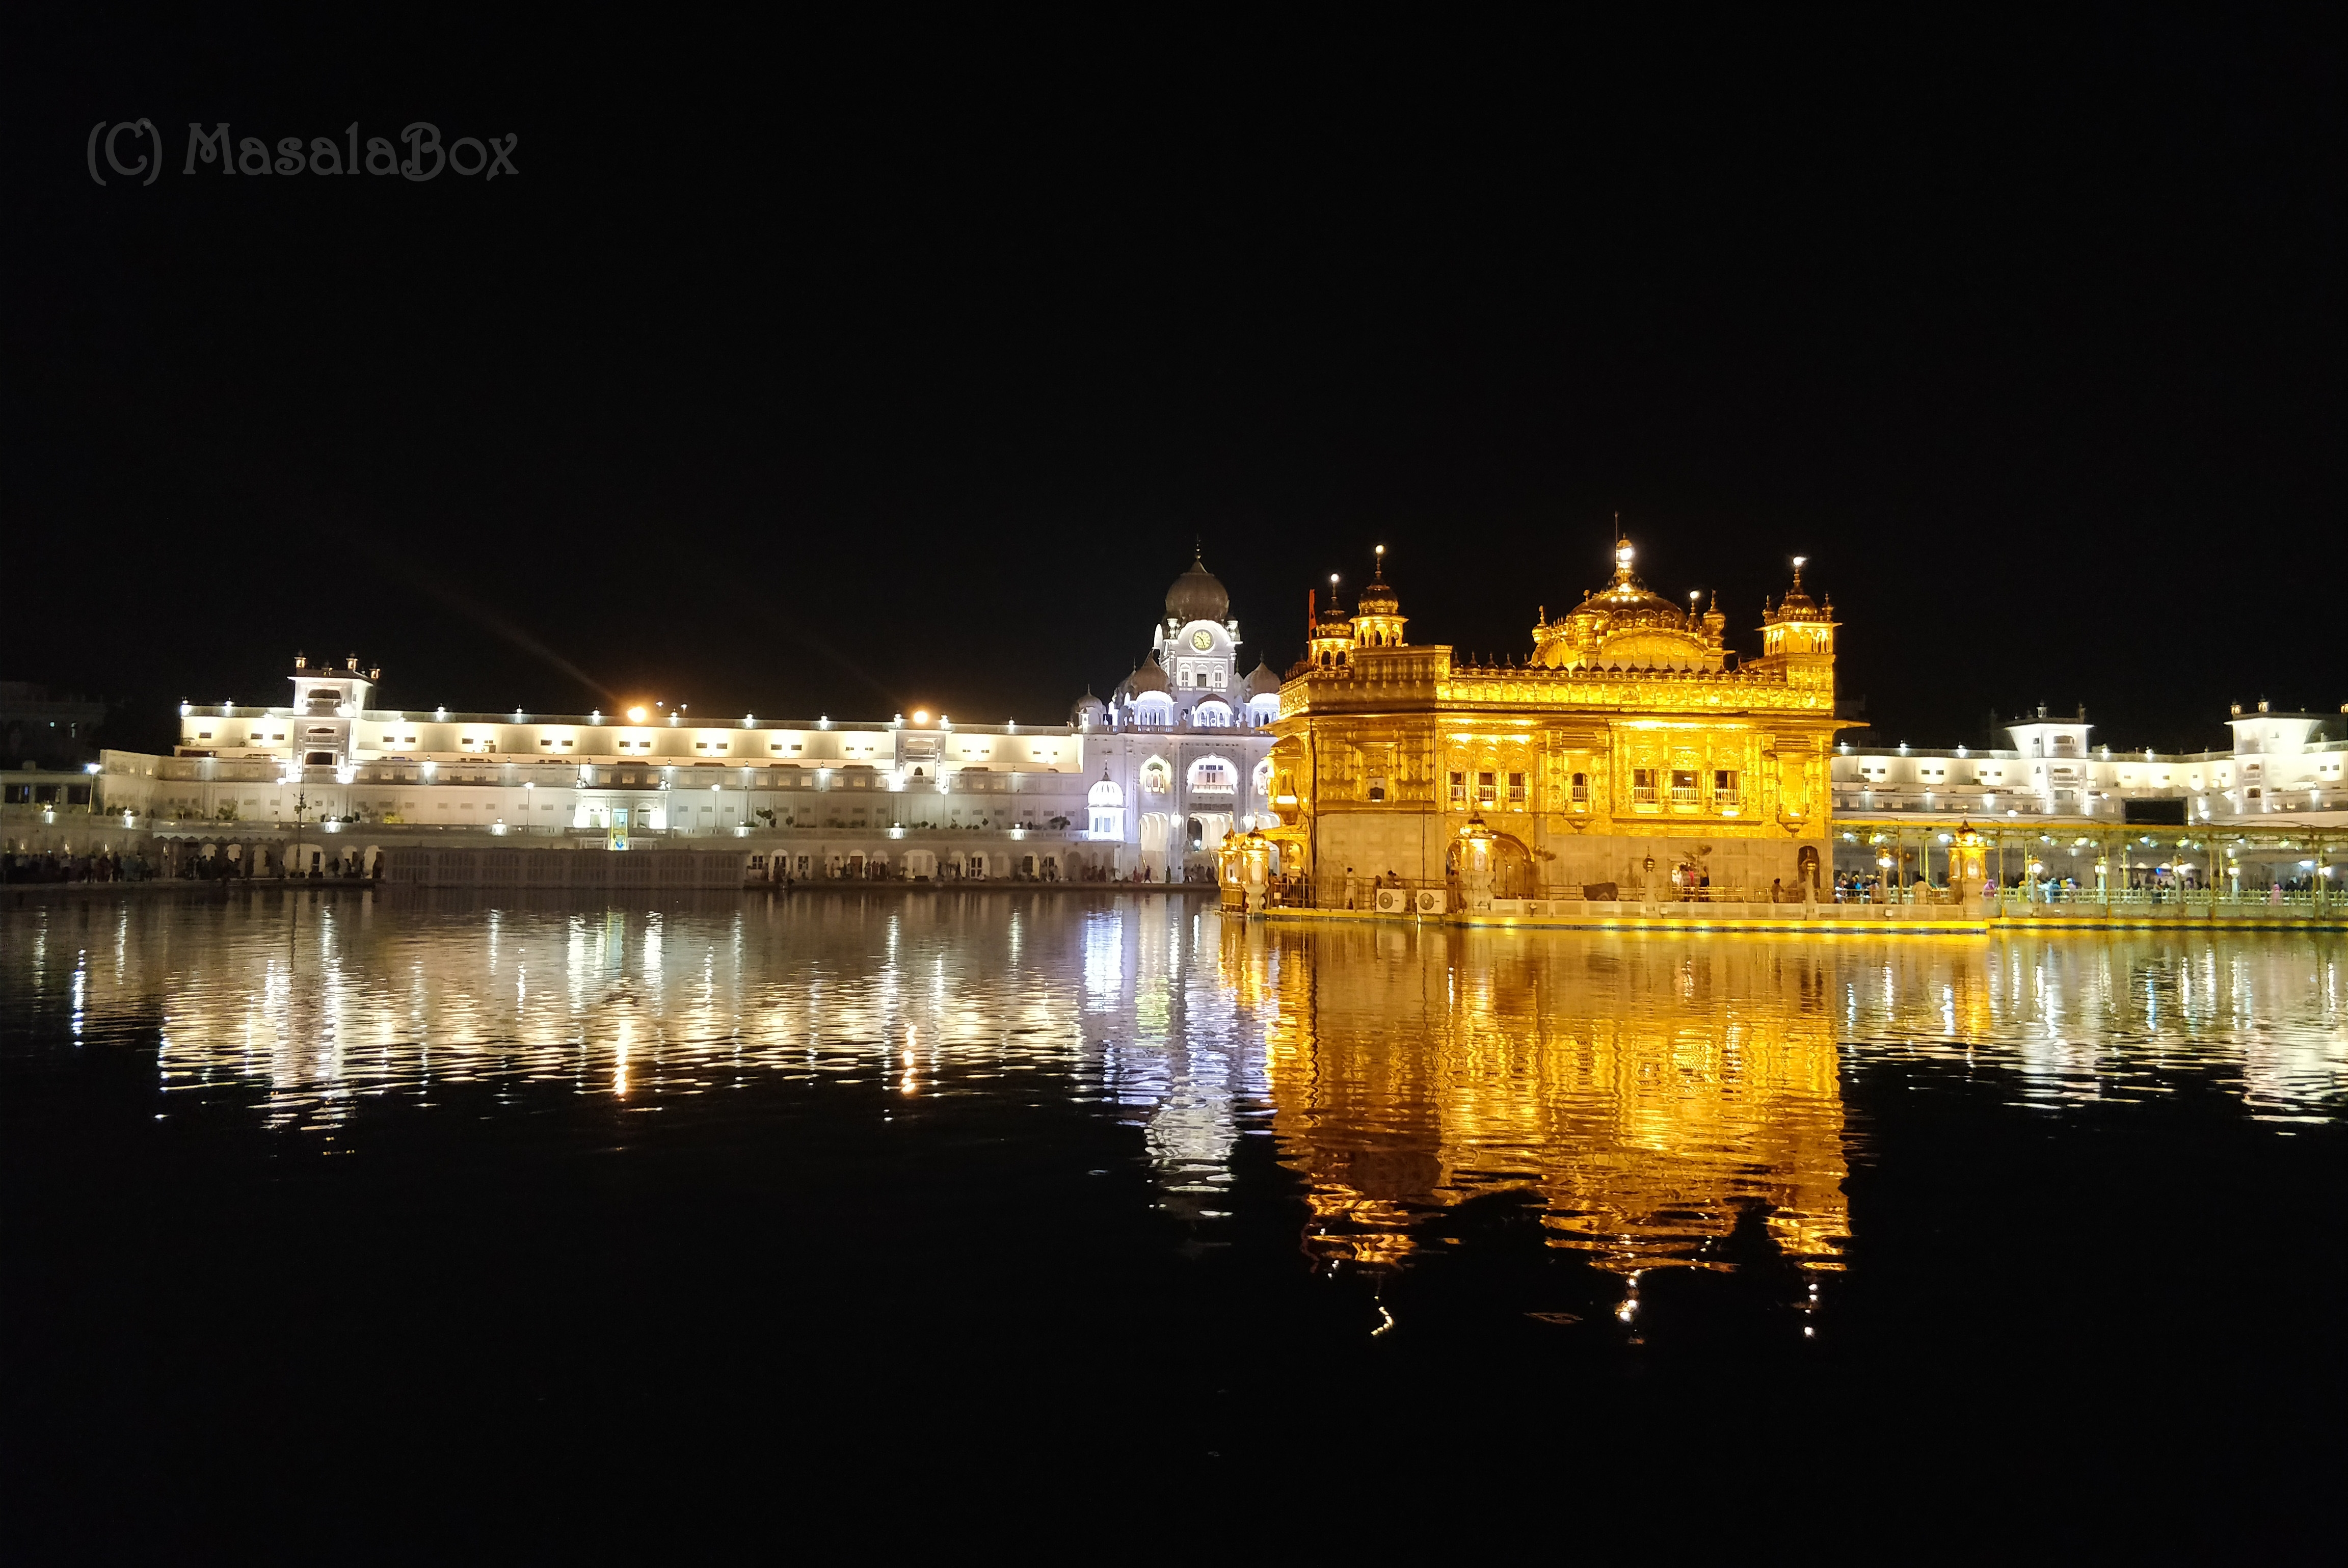 golden templeat night